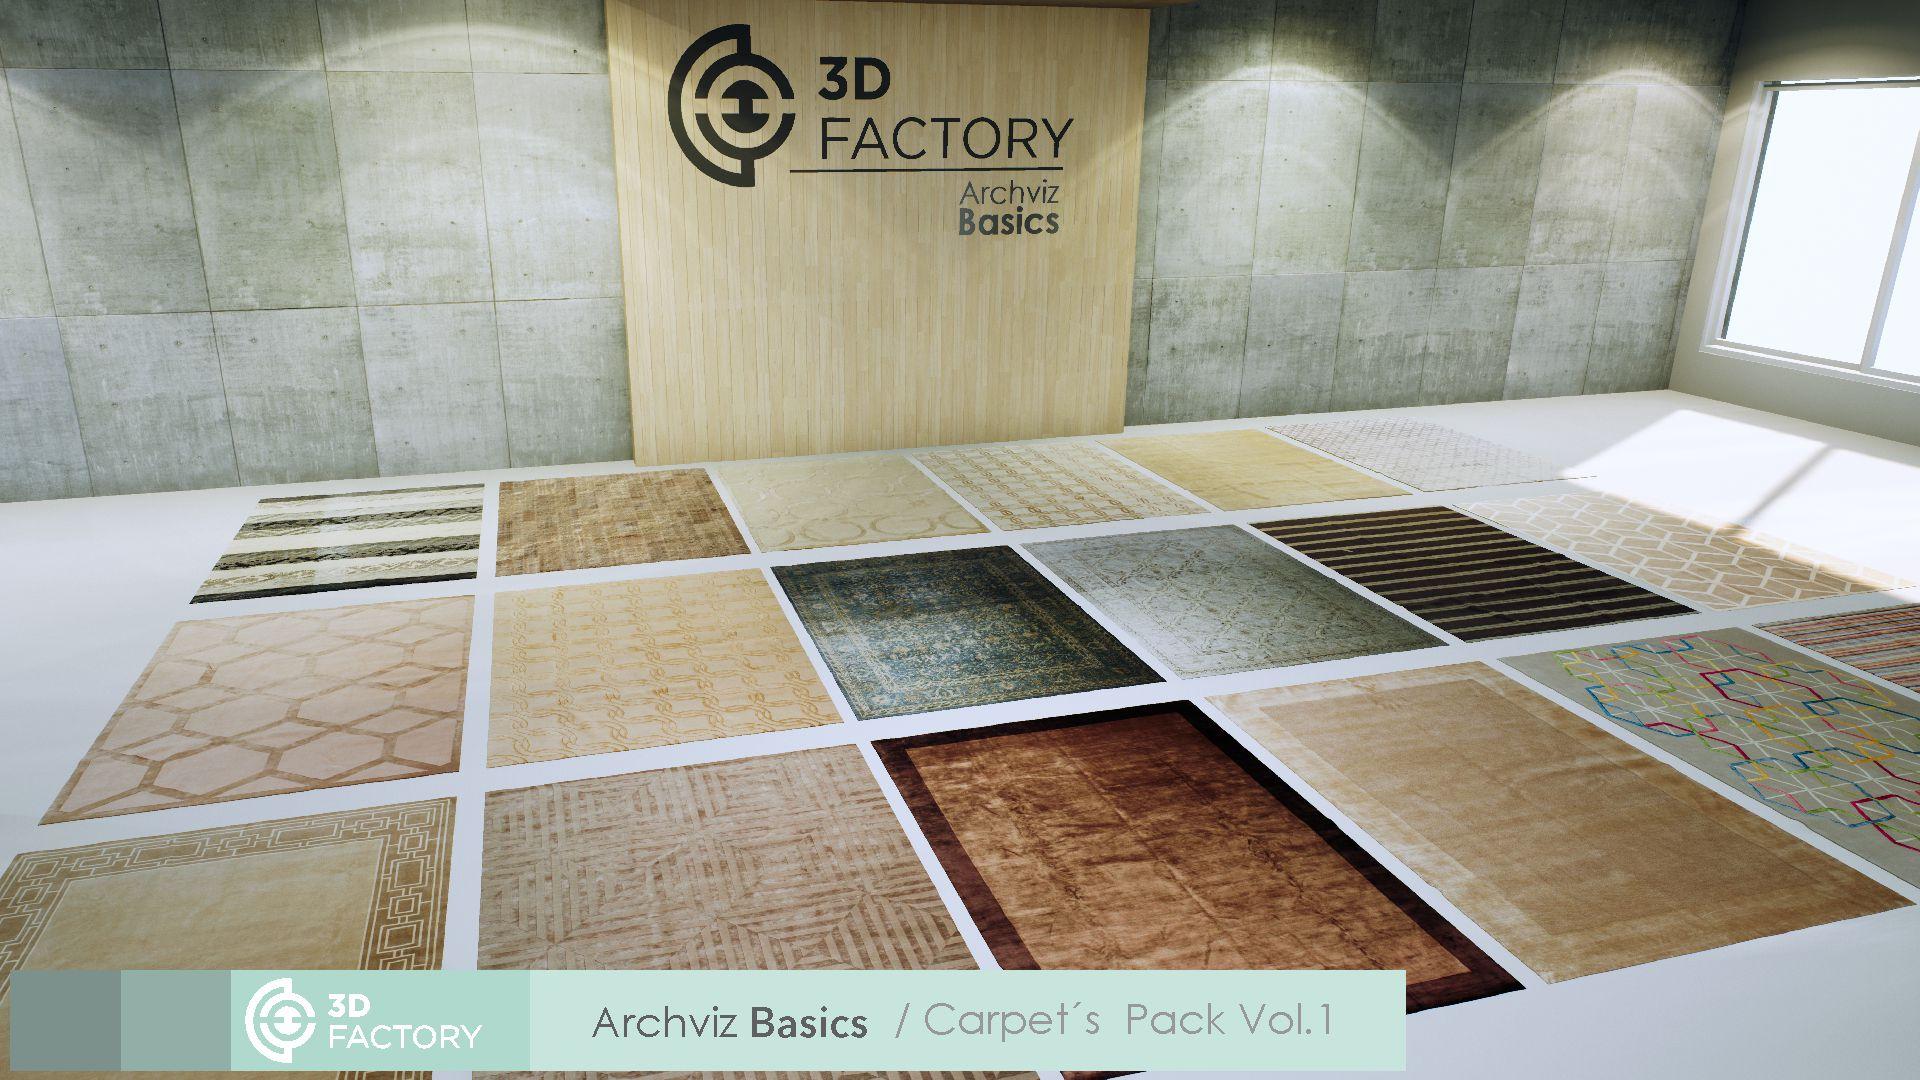 ArchViz Basics - Carpets- Pack Vol  1 by 3d factory in